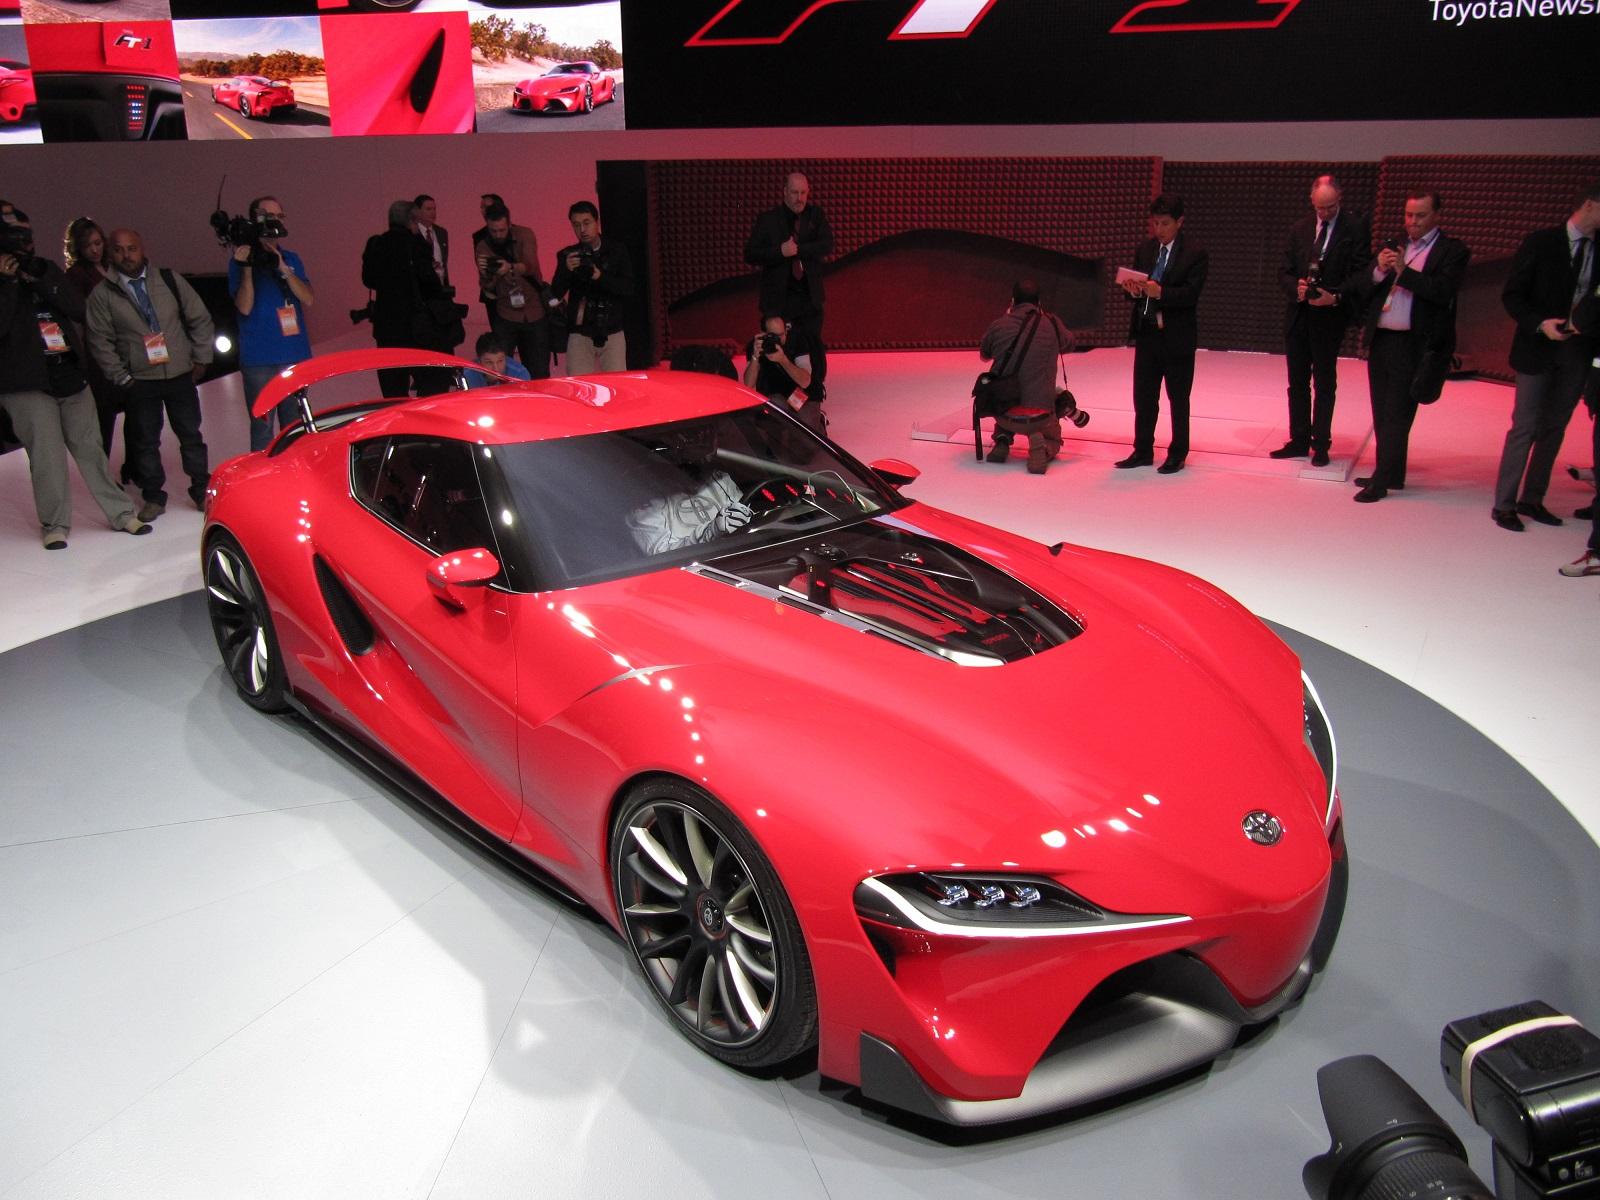 new toyota sports car release dateToyota FT1 Concept 2015 Corvette Z06 2015 Mustang Live Photos